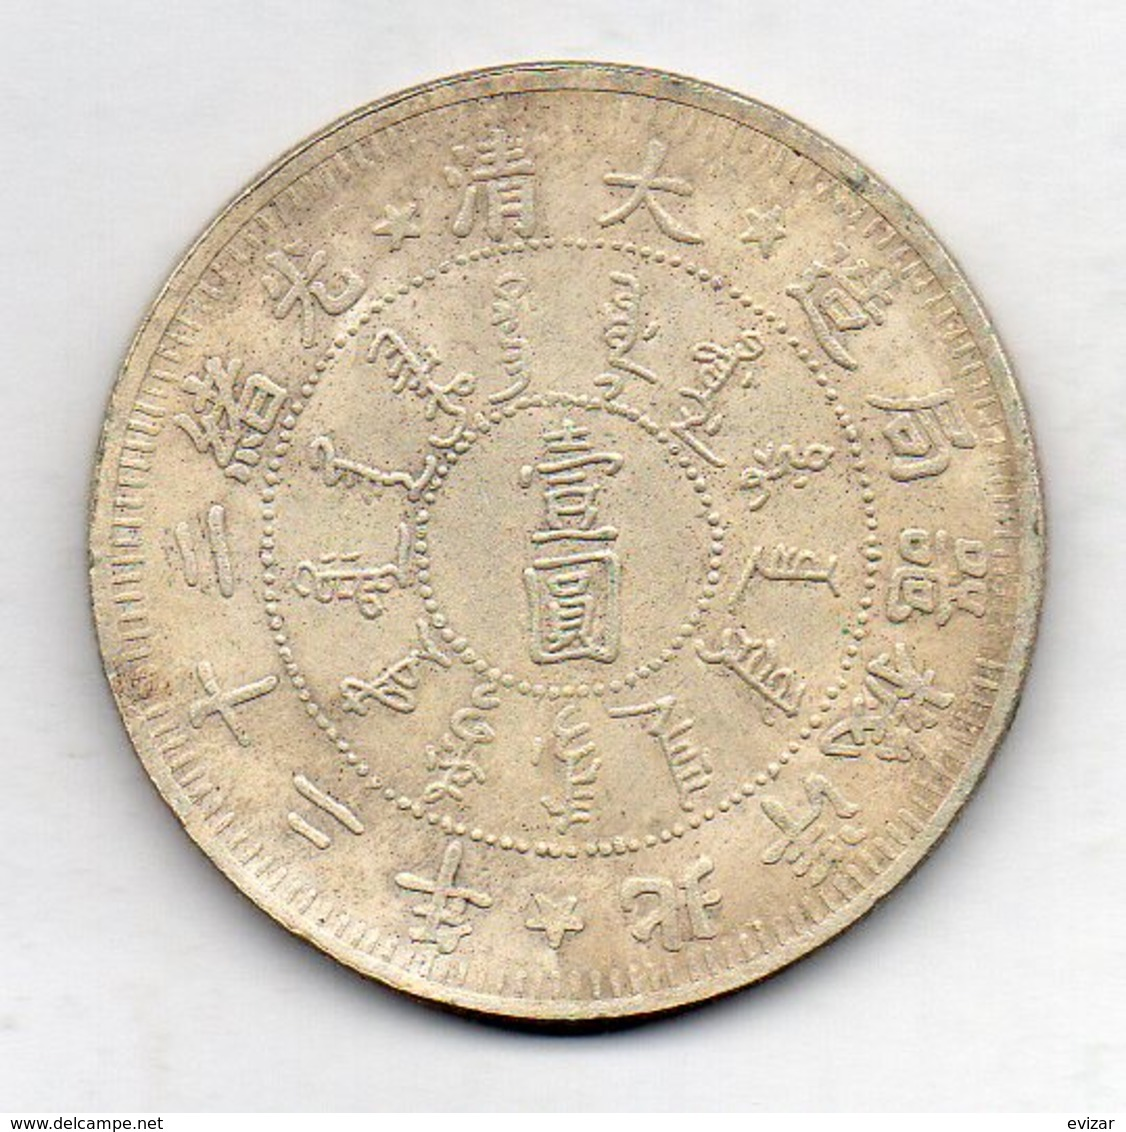 CHINA - CHIHLI PROVINCE, 1 Dollar, Silver, To Identify - China